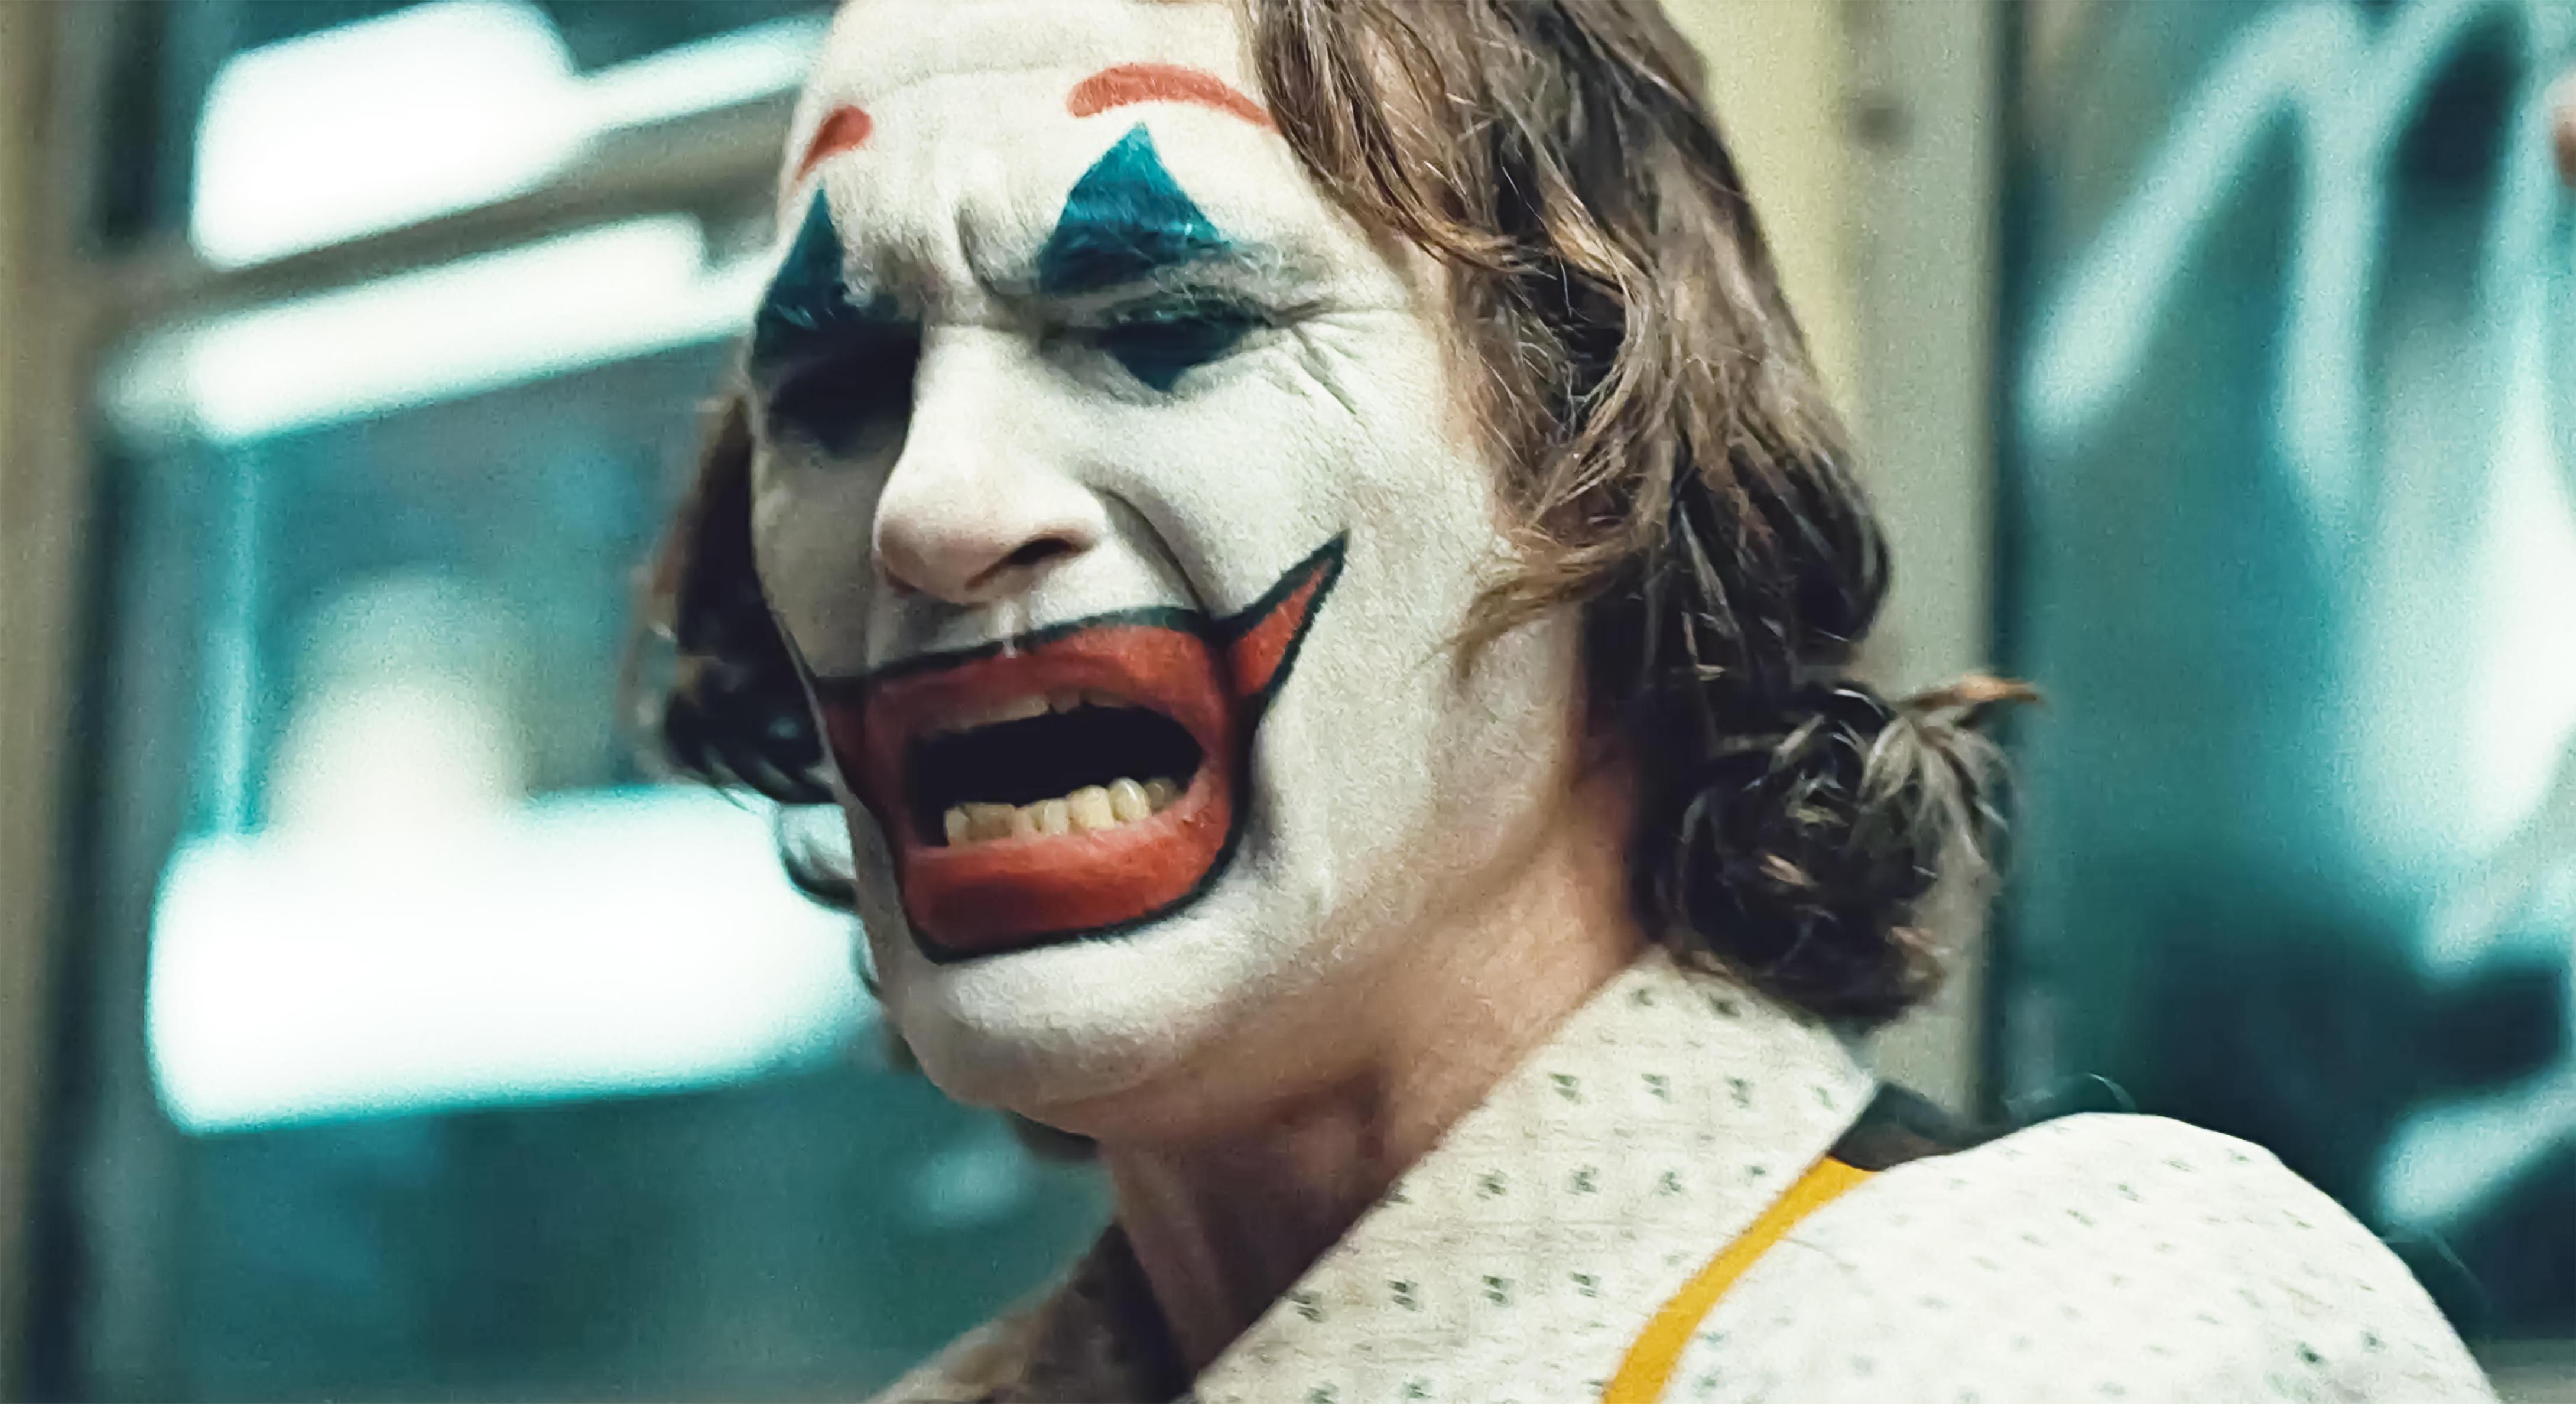 JokerFilm - 3LAugh.jpg